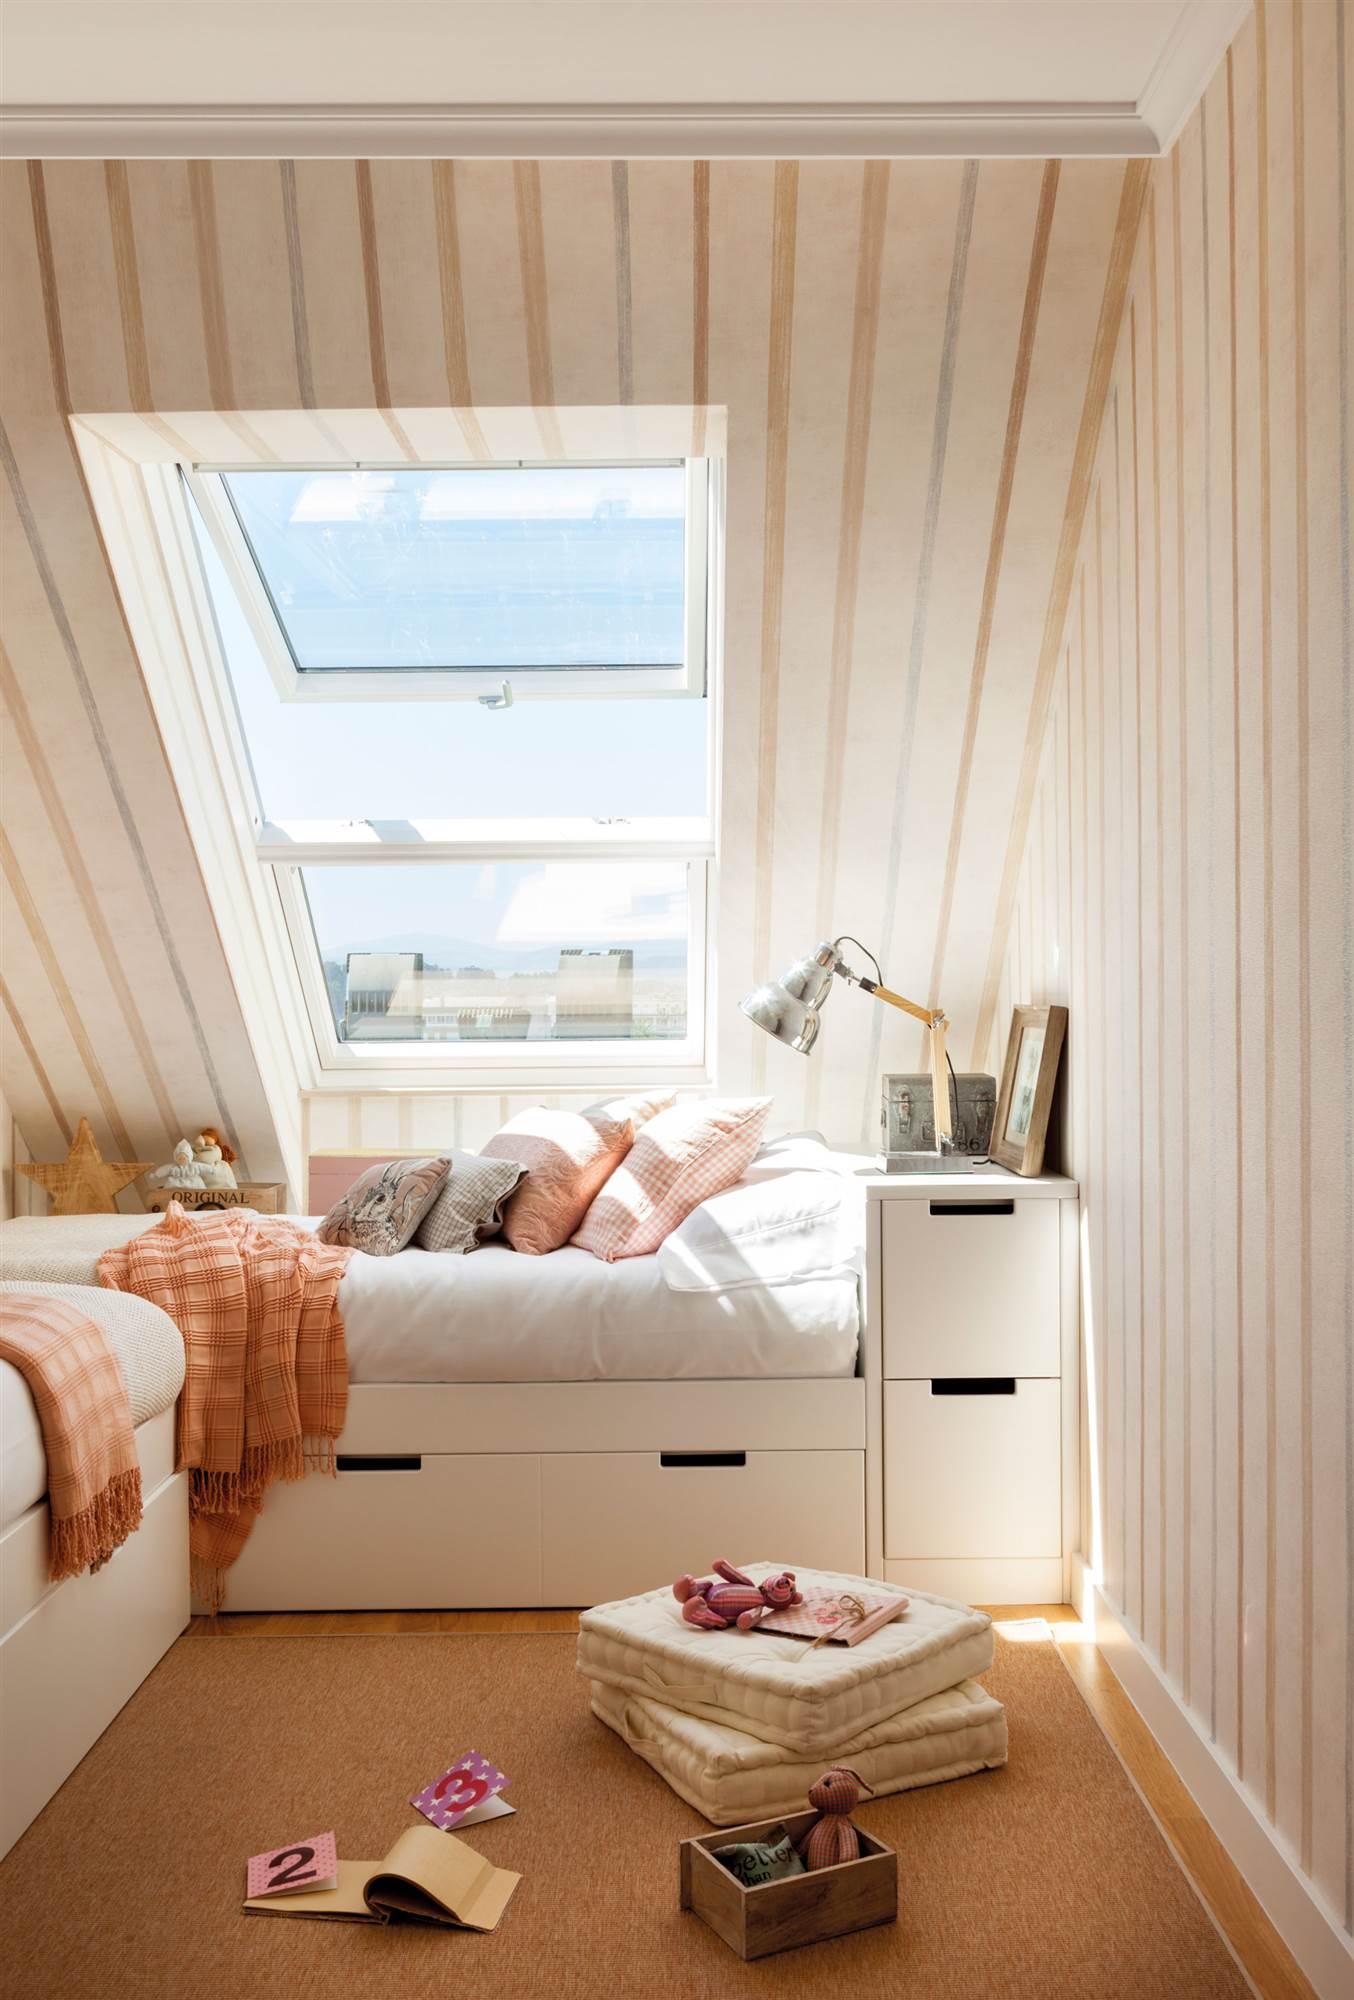 habitacin infantil en buhardilla con papel pintado 00466690 buhardillas con encanto - Buhardillas Con Encanto